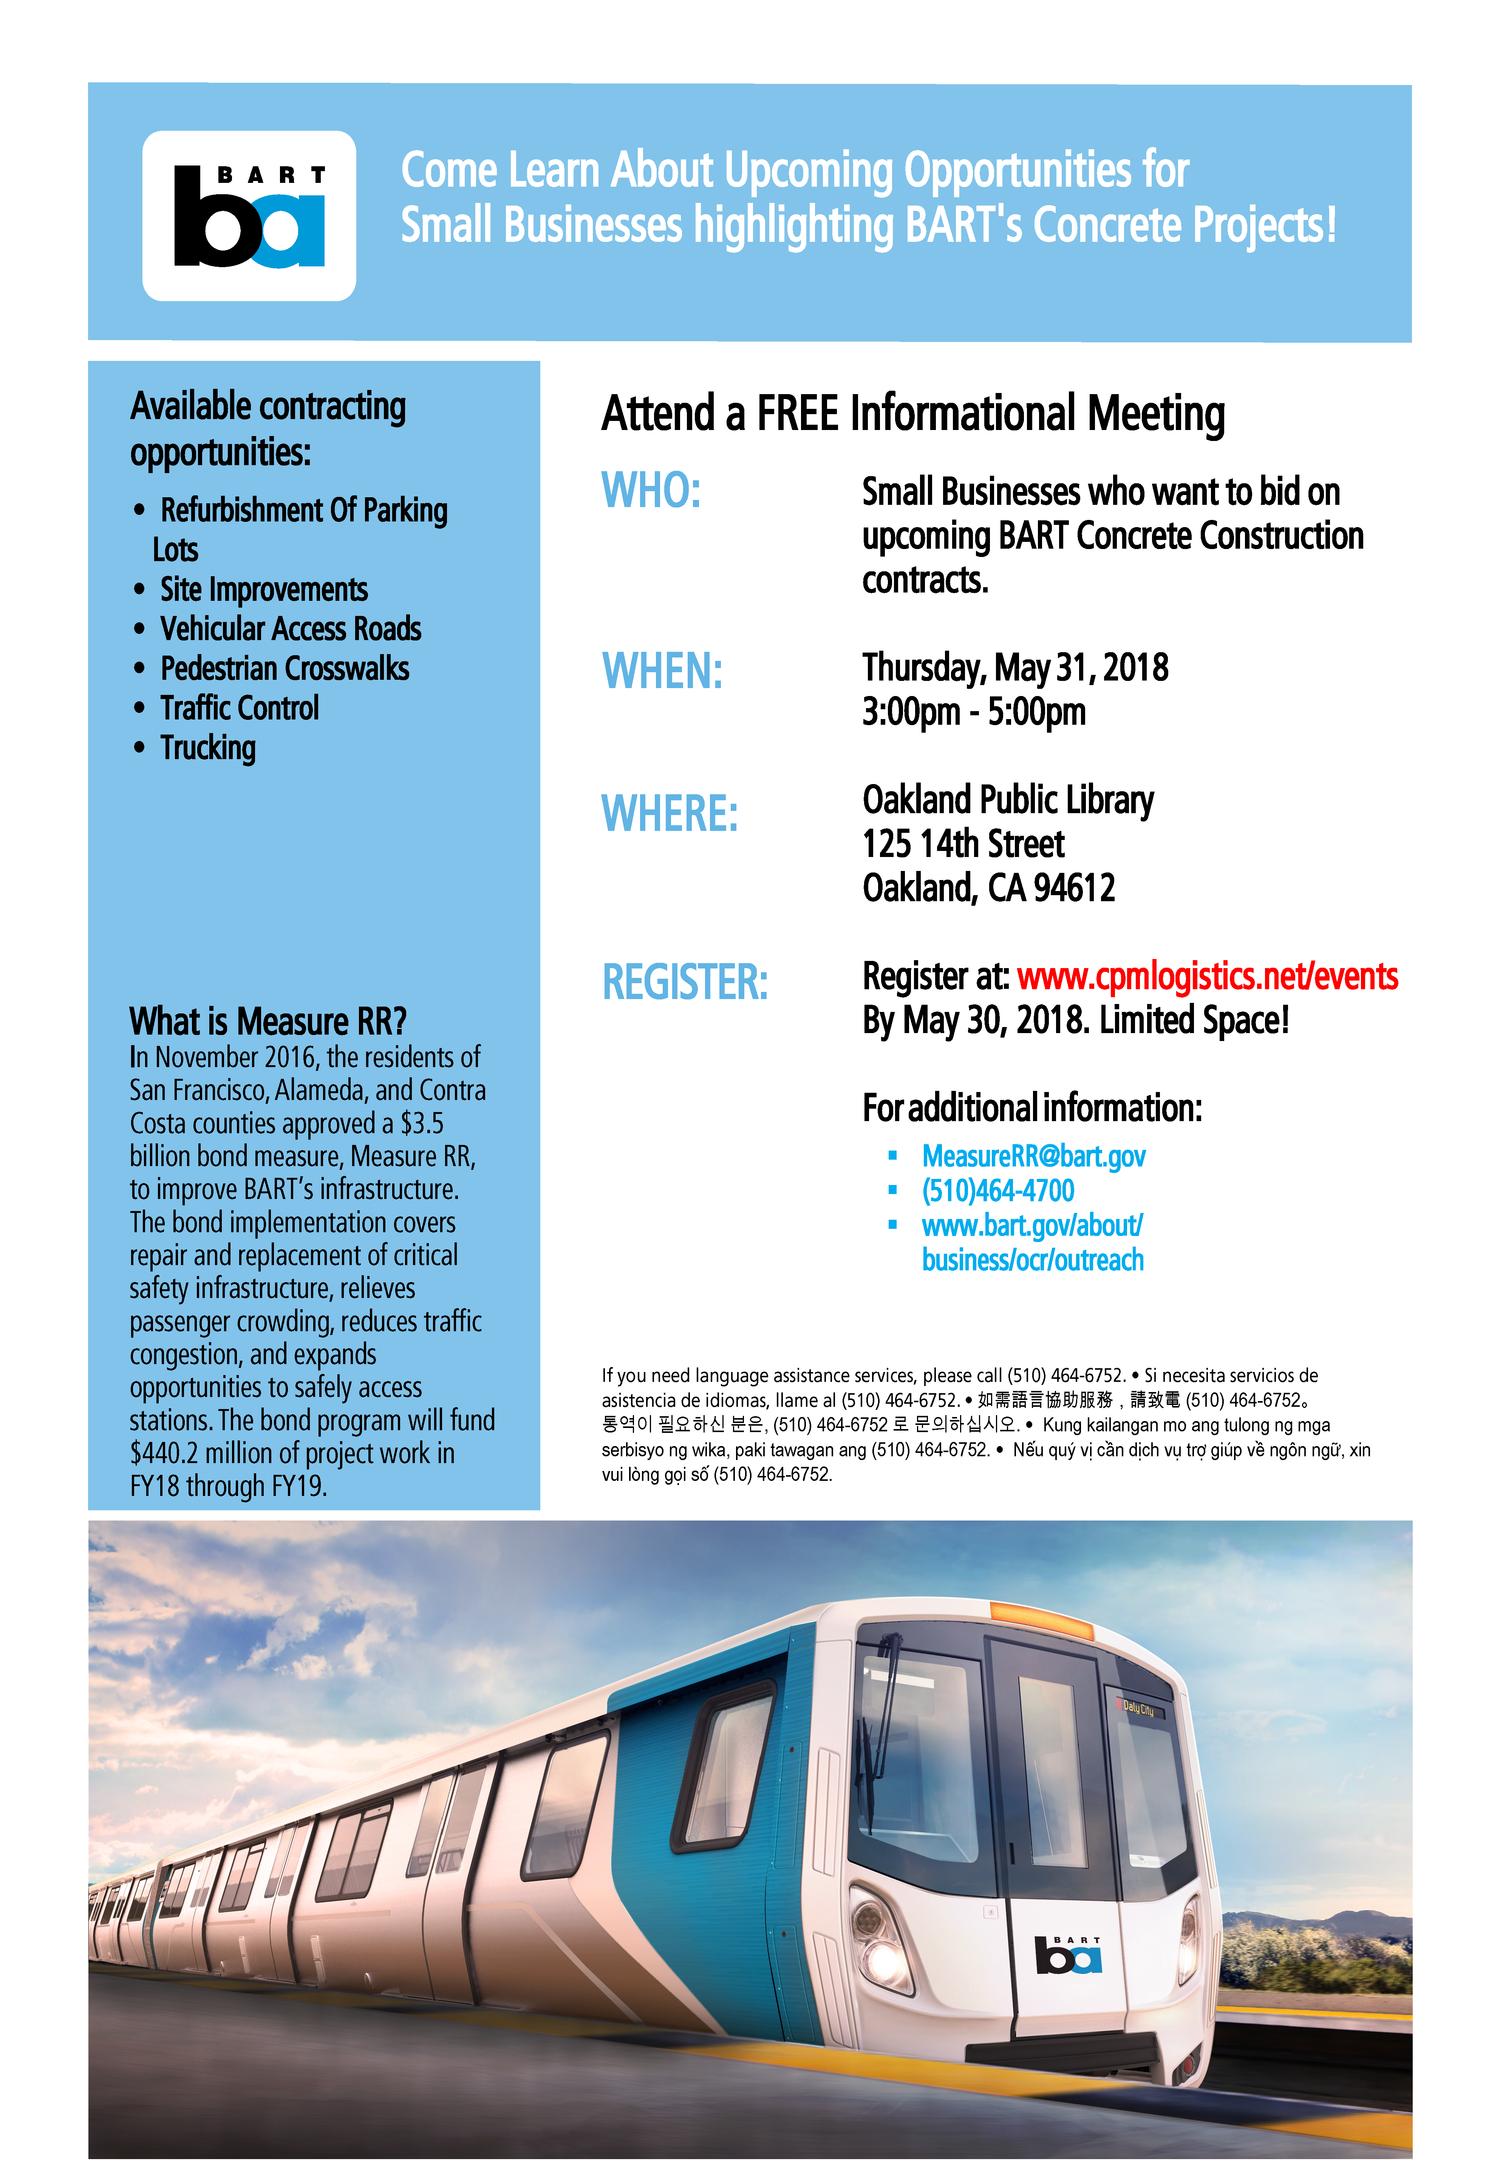 BART Concrete Meeting (Oakland) — CPM Logistics